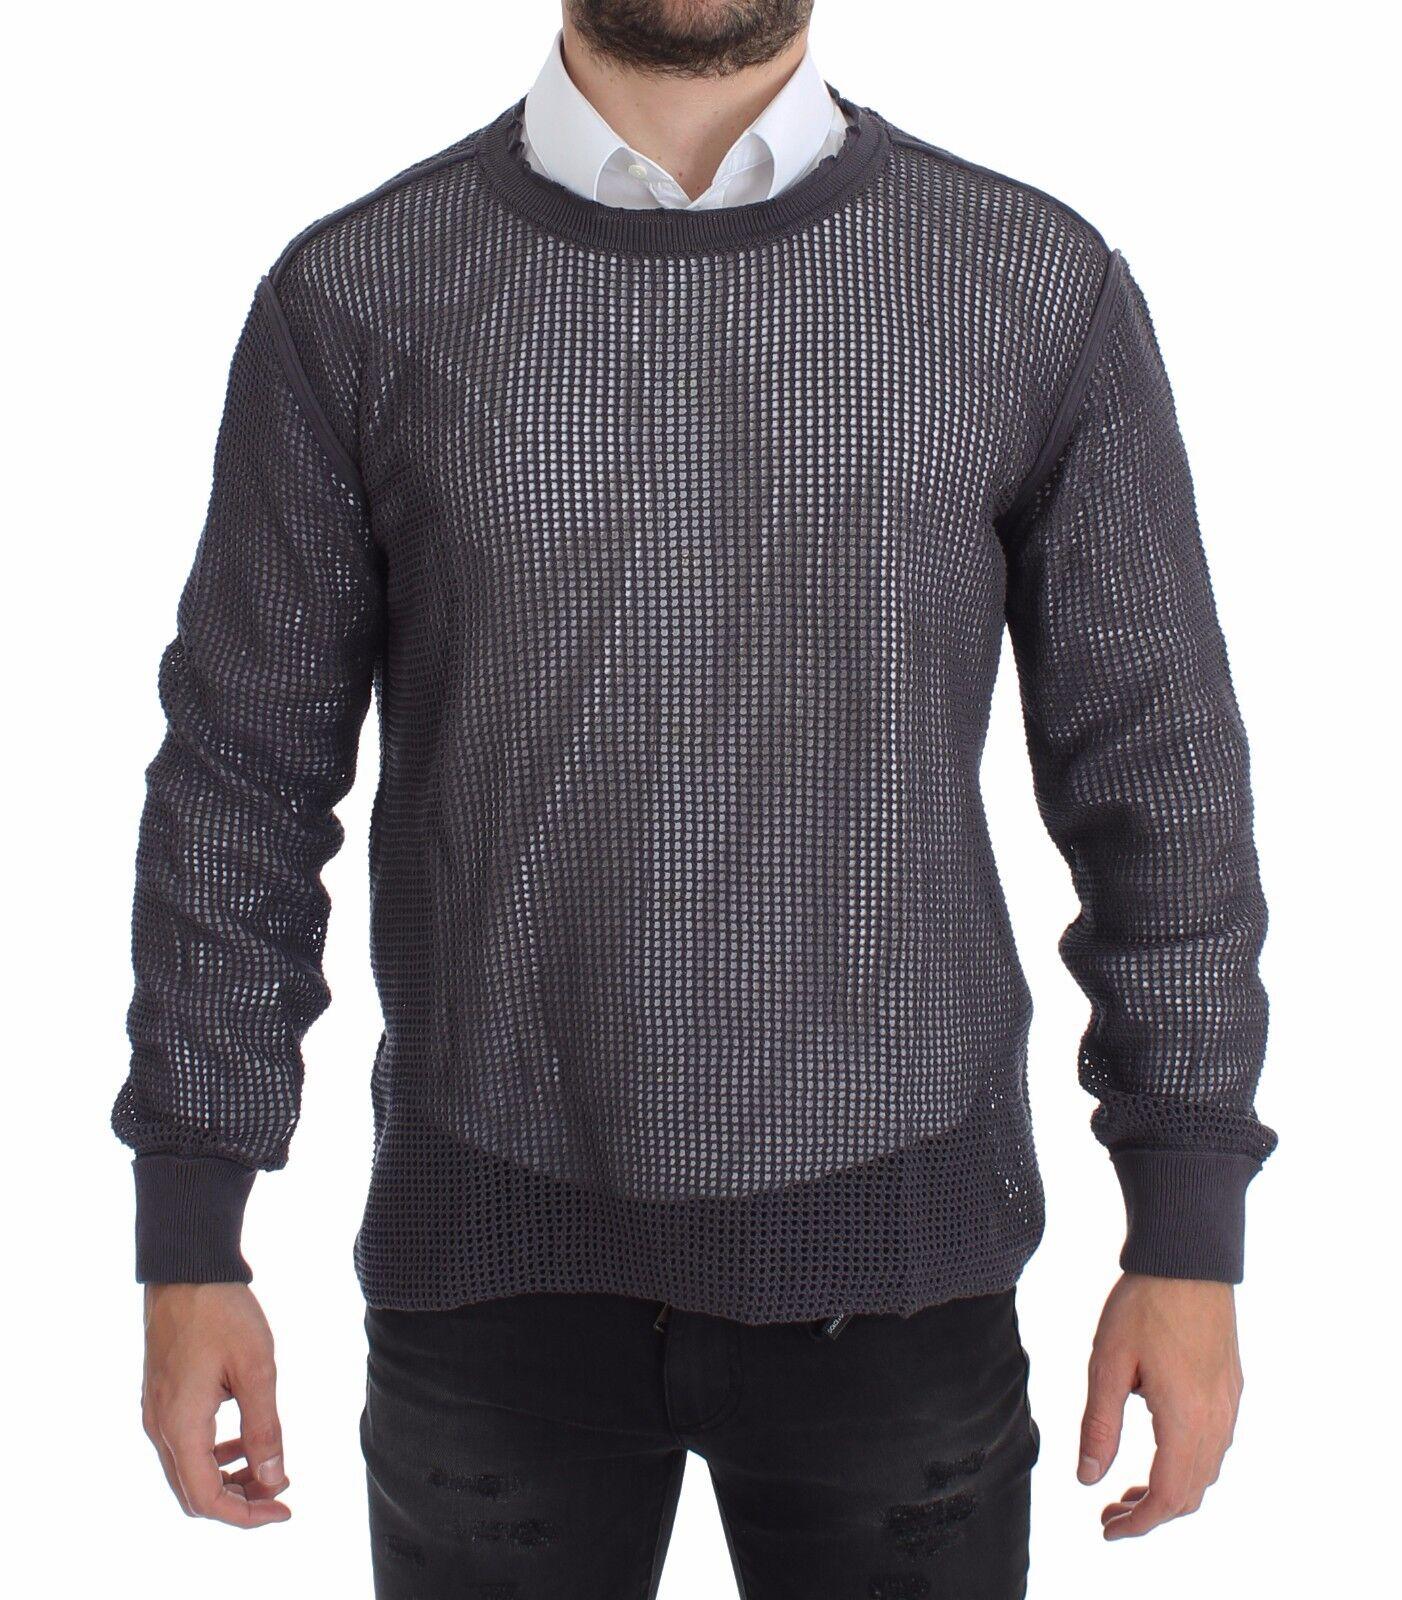 NWT DOLCE & GABBANA lila Runway Netz Pullover Netted Sweater IT54 / XXL